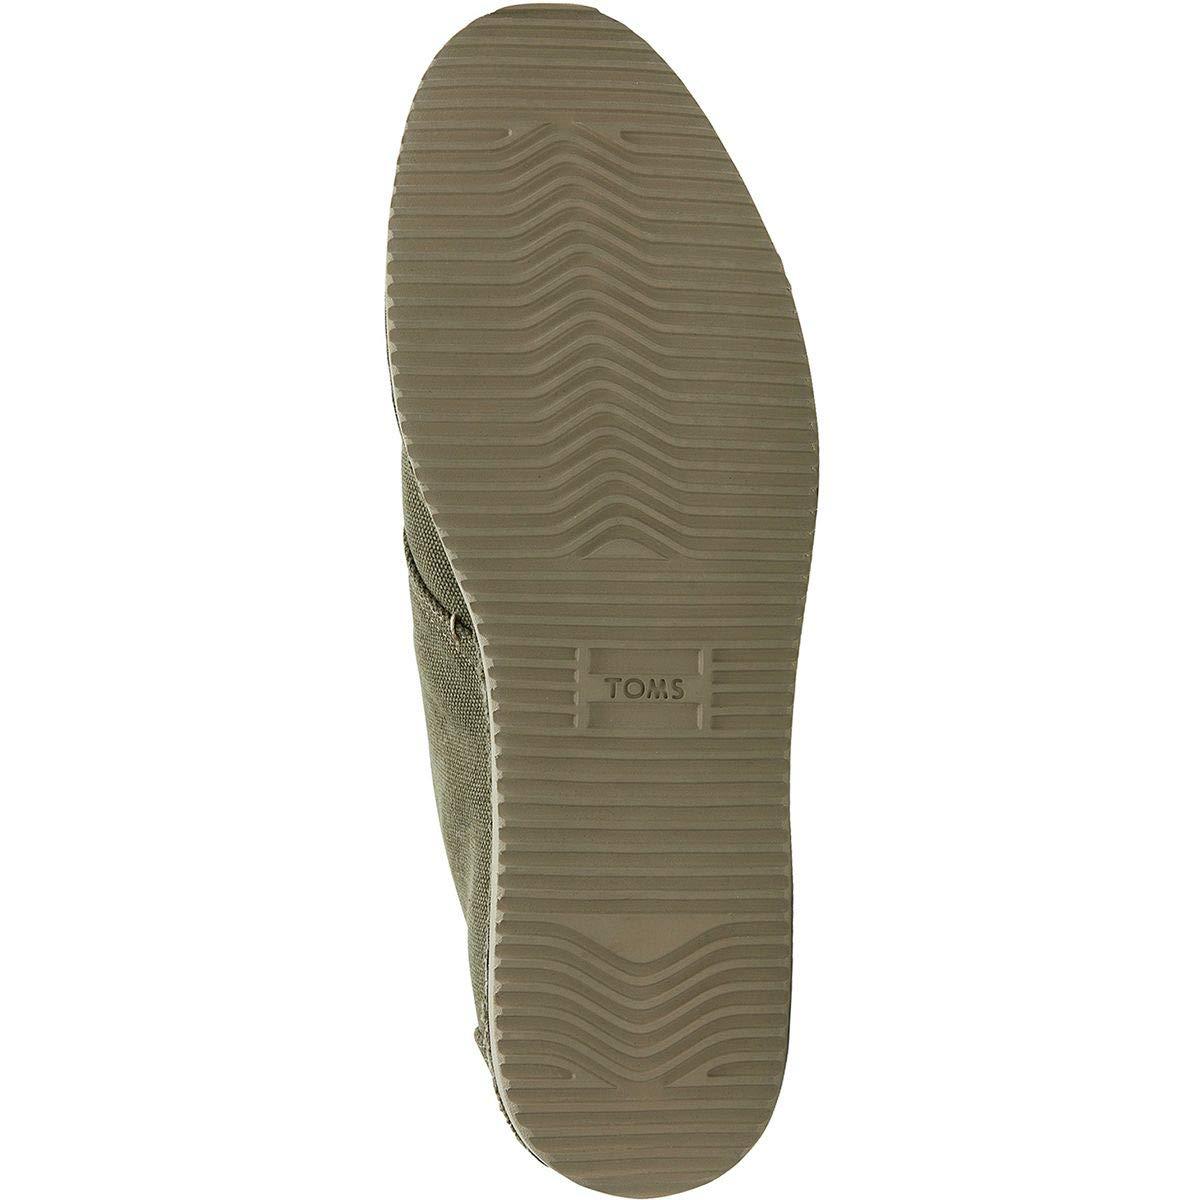 Chaussures Fitness De Homm Toms 10013276 WDHIYE92